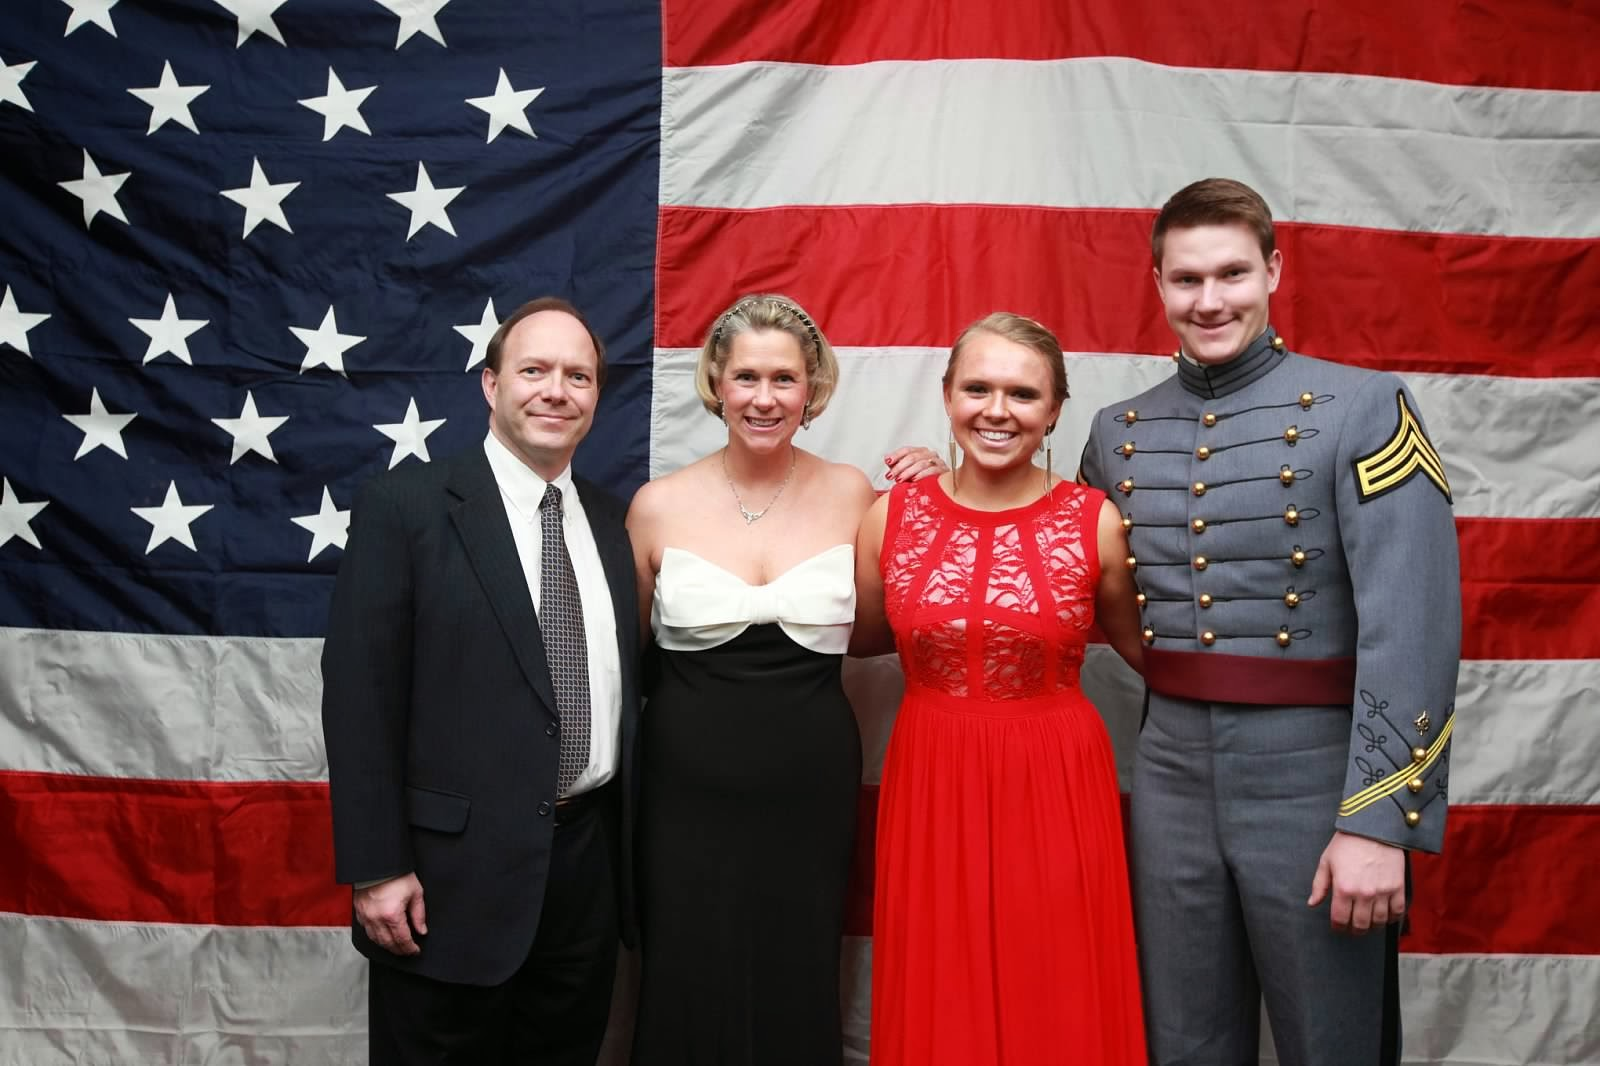 NE Ohio All Academy Military Ball, December 27, 2013